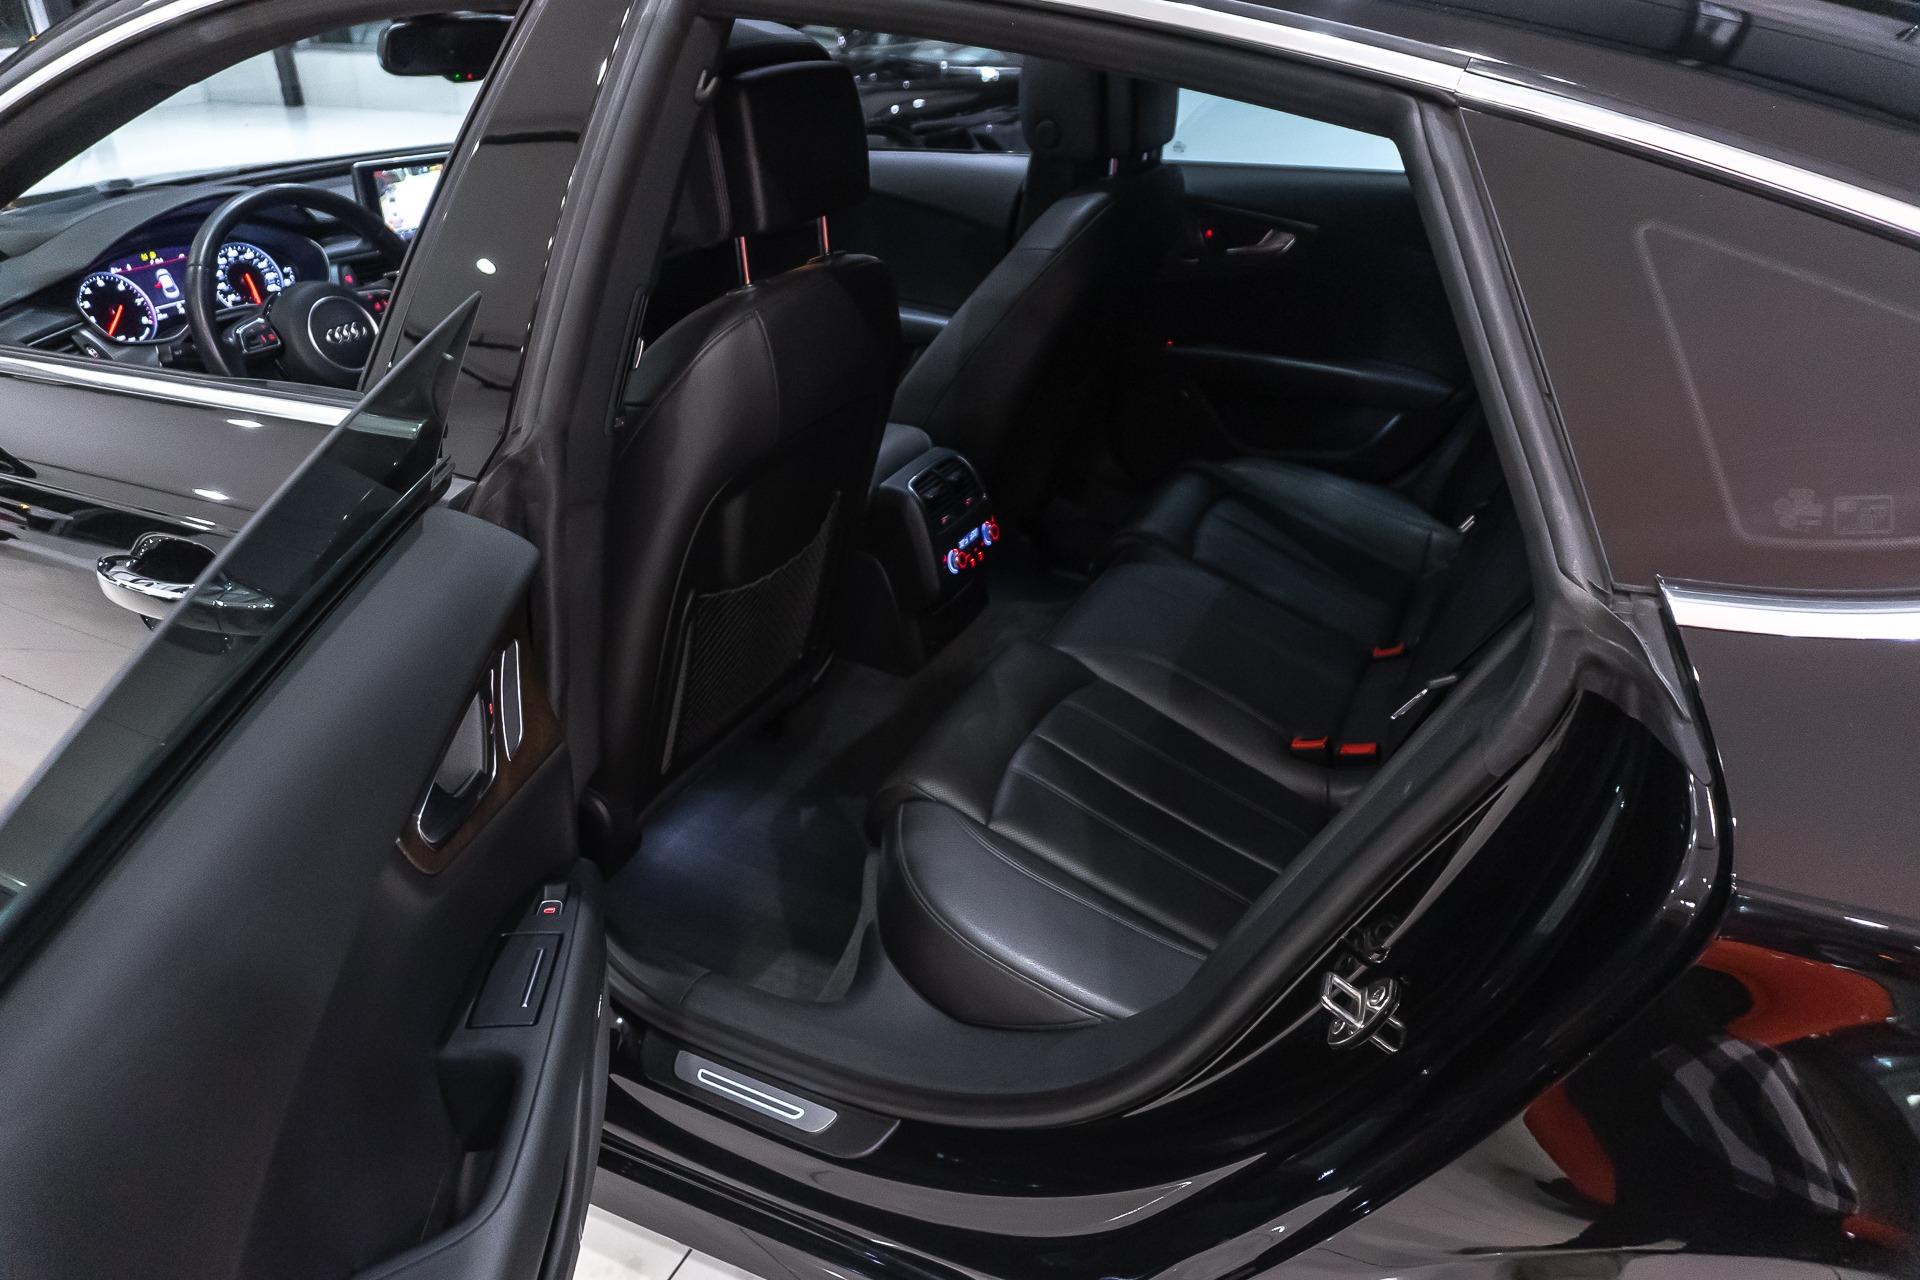 Used-2016-Audi-A7-30T-Prestige-quattro-Hatchback-MSRP-76K-S-LINE-SPORT-PACKAGE